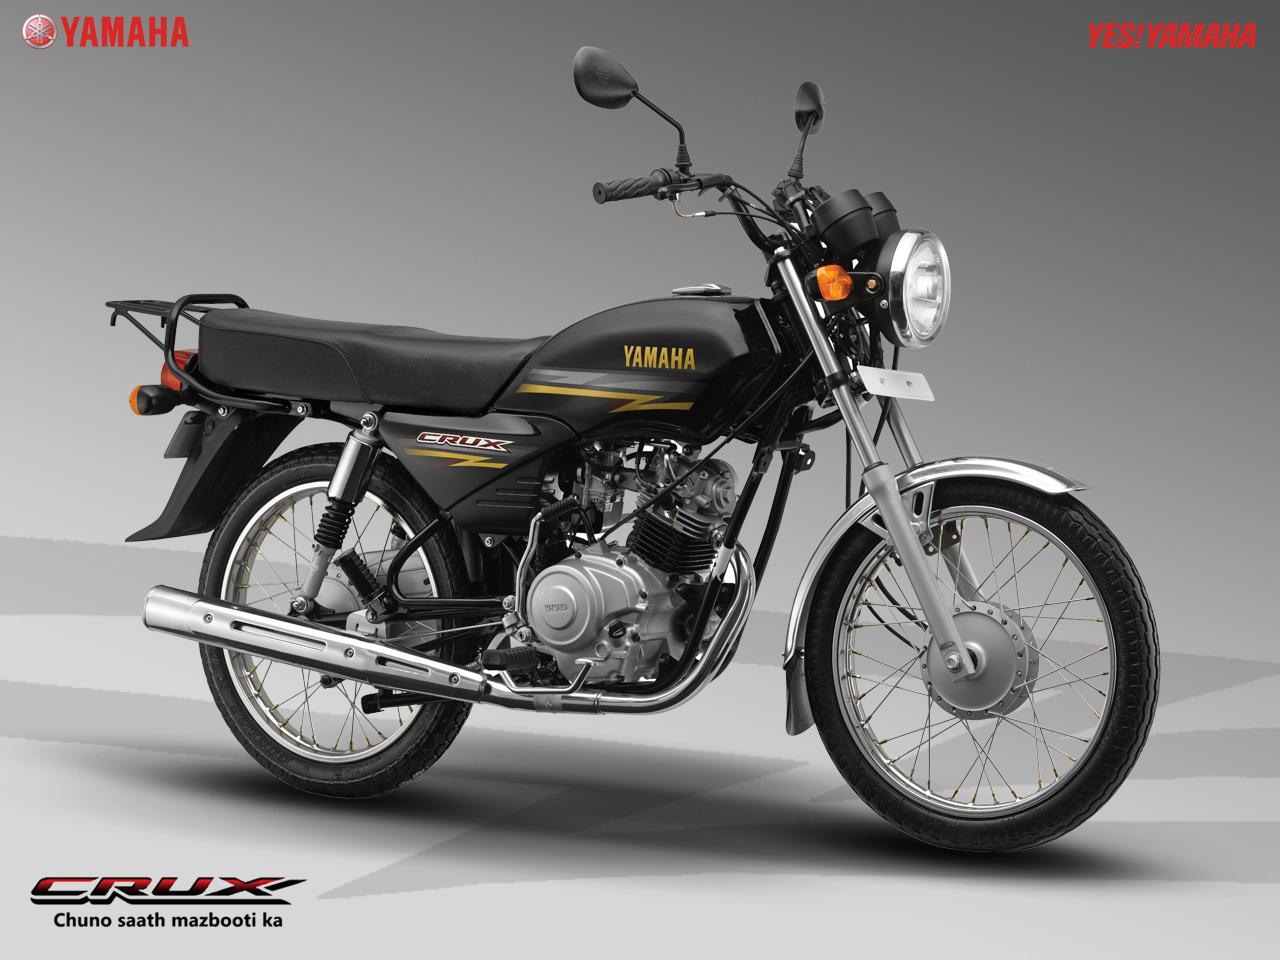 2013 Yamaha 100  Picture 2662733  BikePicscom